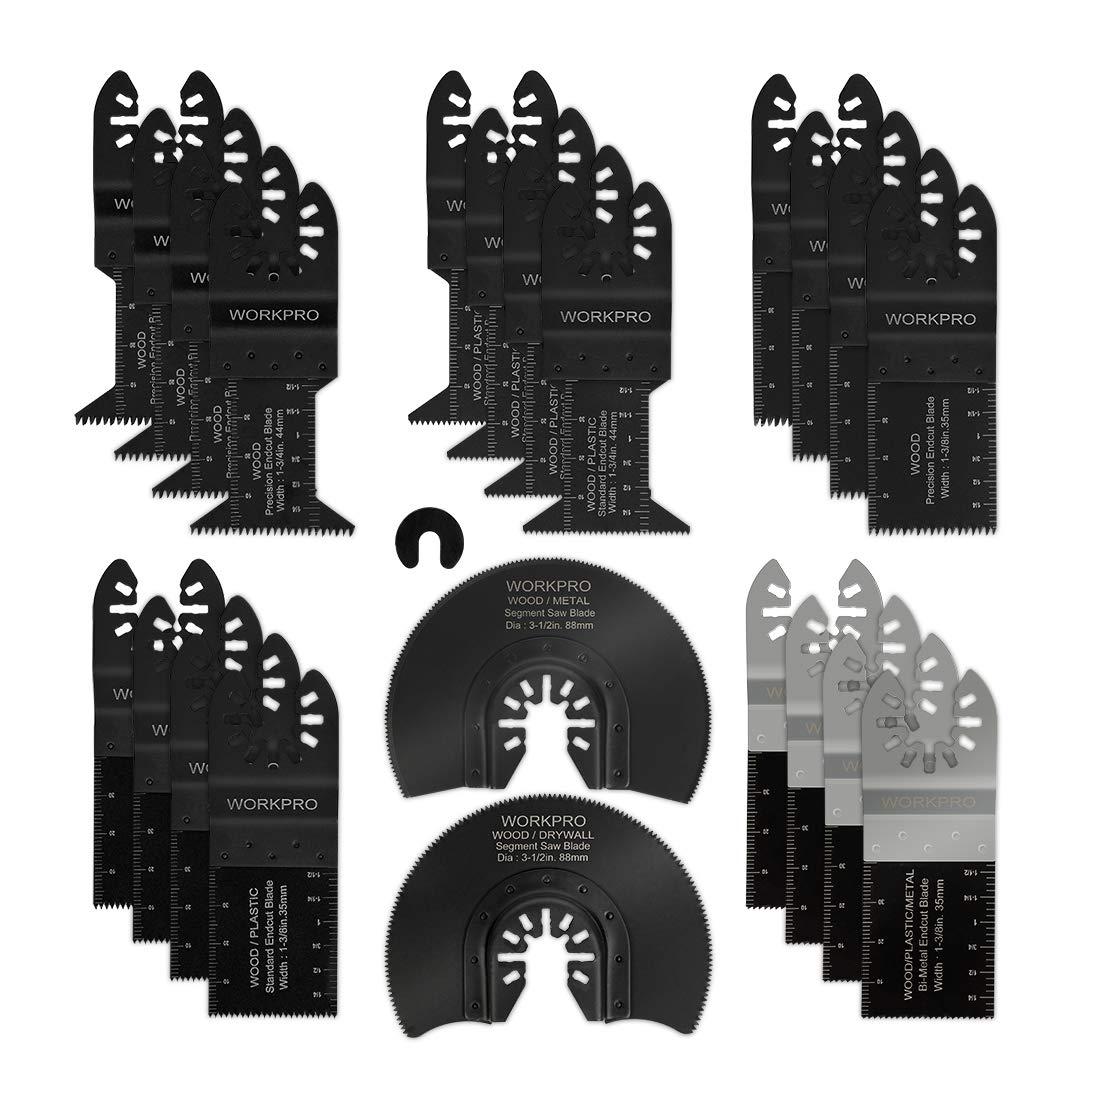 WORKPRO Oscillating Saw Blades Kit, 23-piece Multitool Quick Release Saw Blades Fit Porter Cable Black & Decker Rockwell Ridgid Ryobi Milwaukee DeWalt Chicago Craftsman